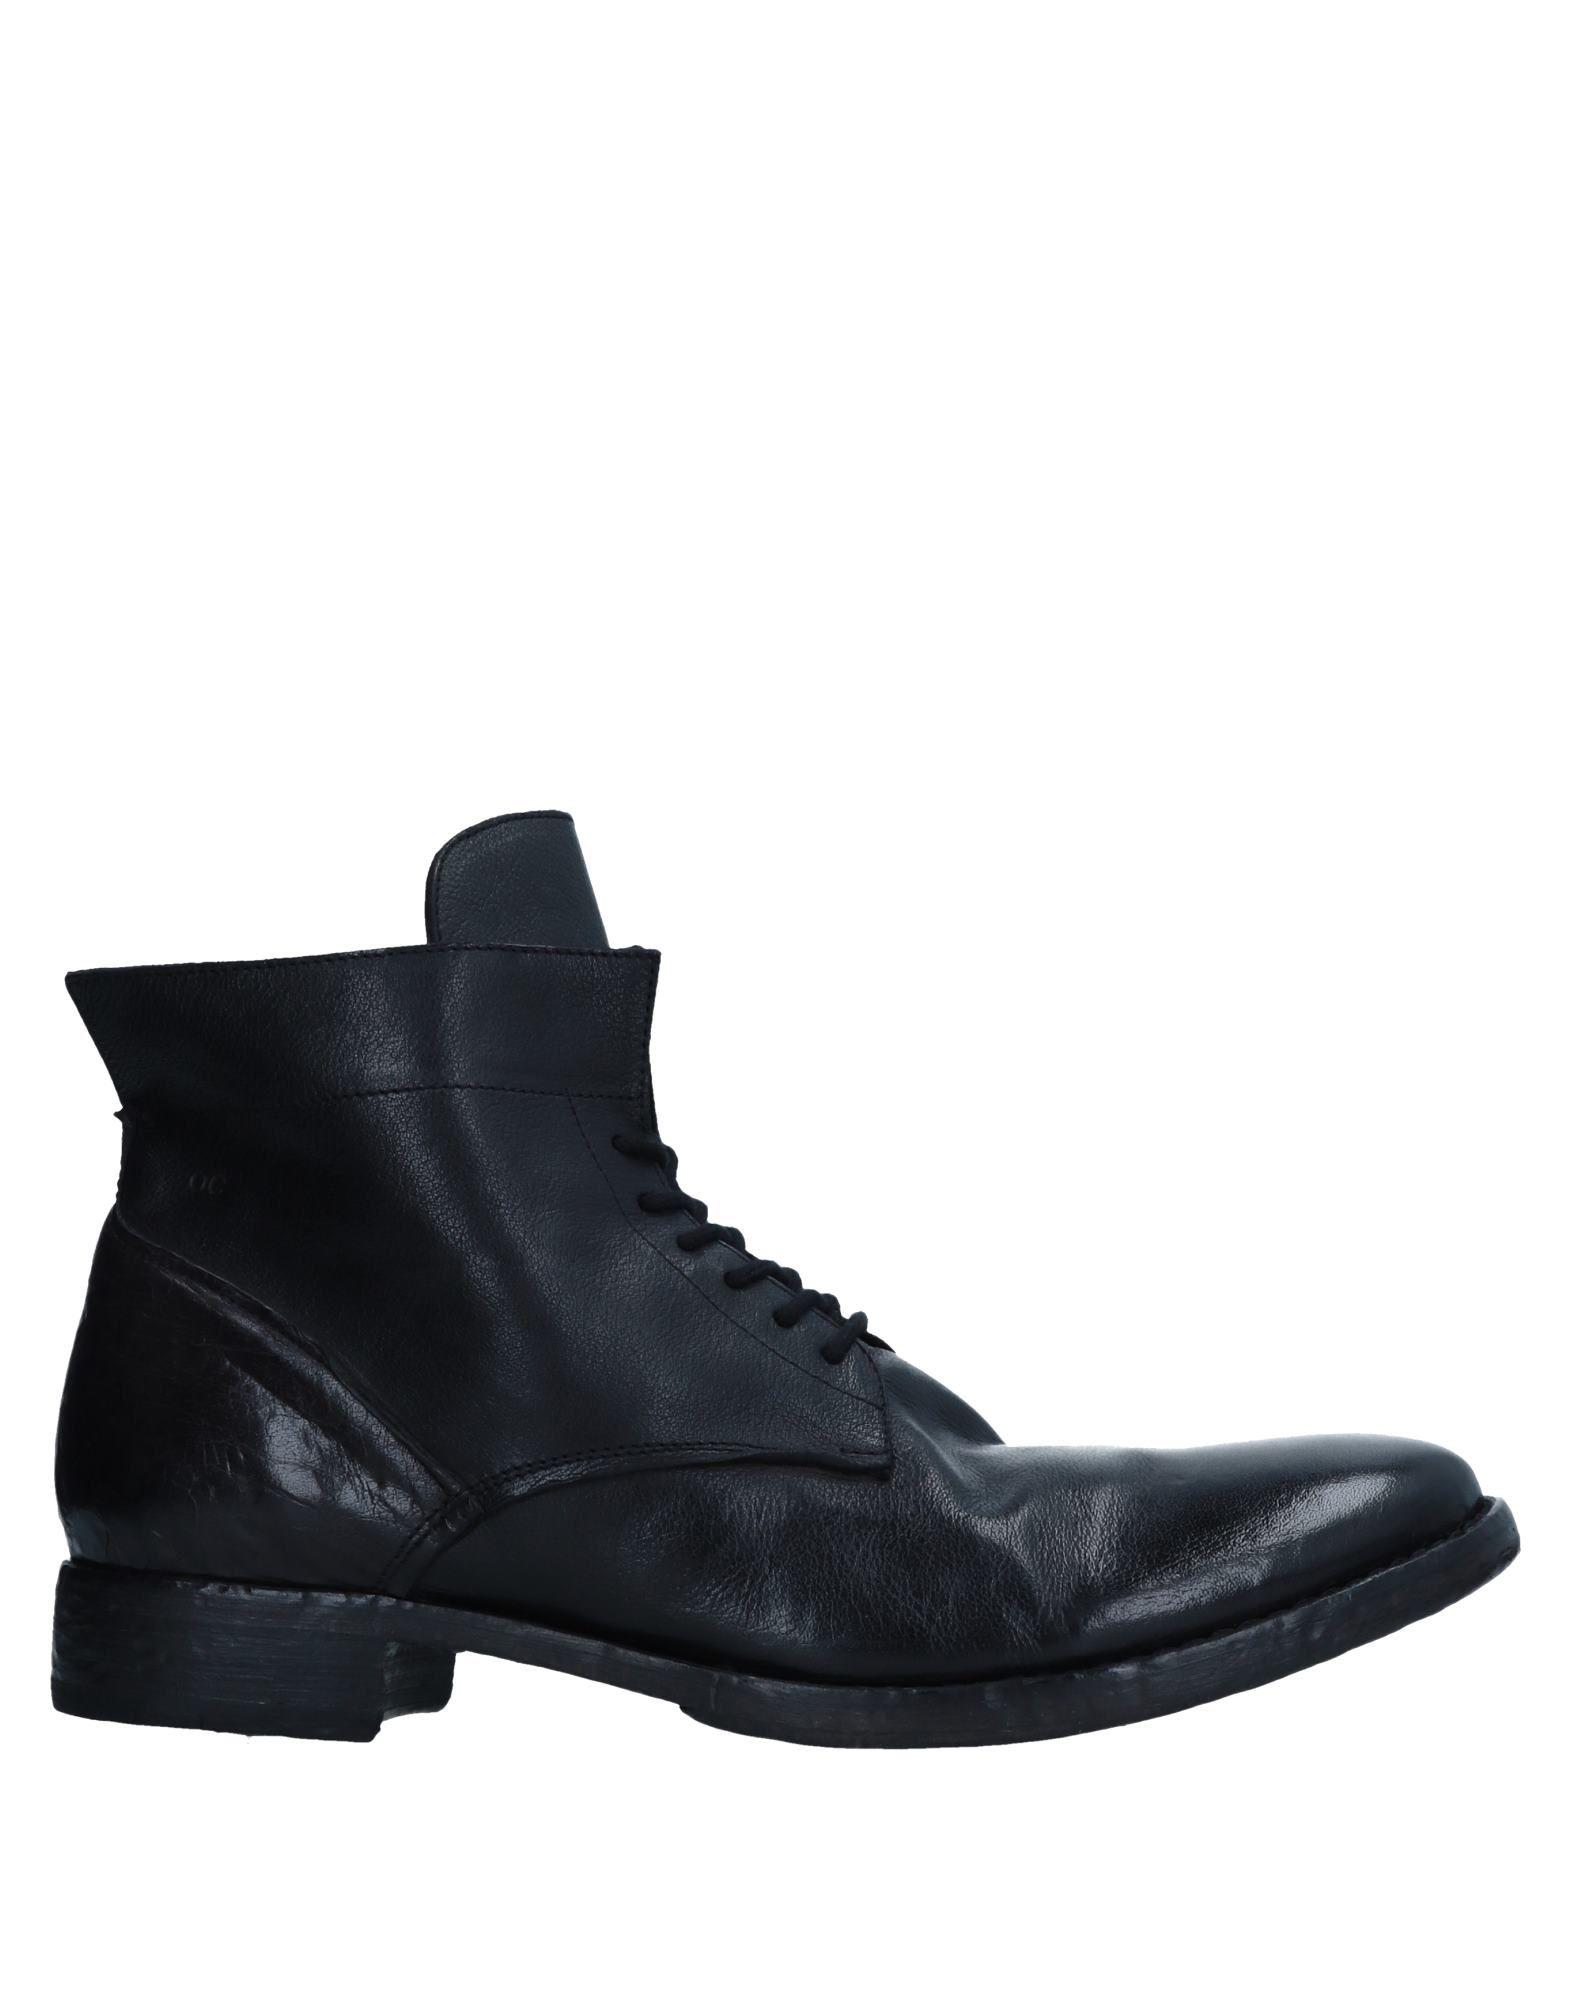 OPEN CLOSED SHOES Полусапоги и высокие ботинки wetkiss 2018 super big size 30 48 women sandals fashion gladiator lace up summer shoes high thick heeled sandals open toe shoes